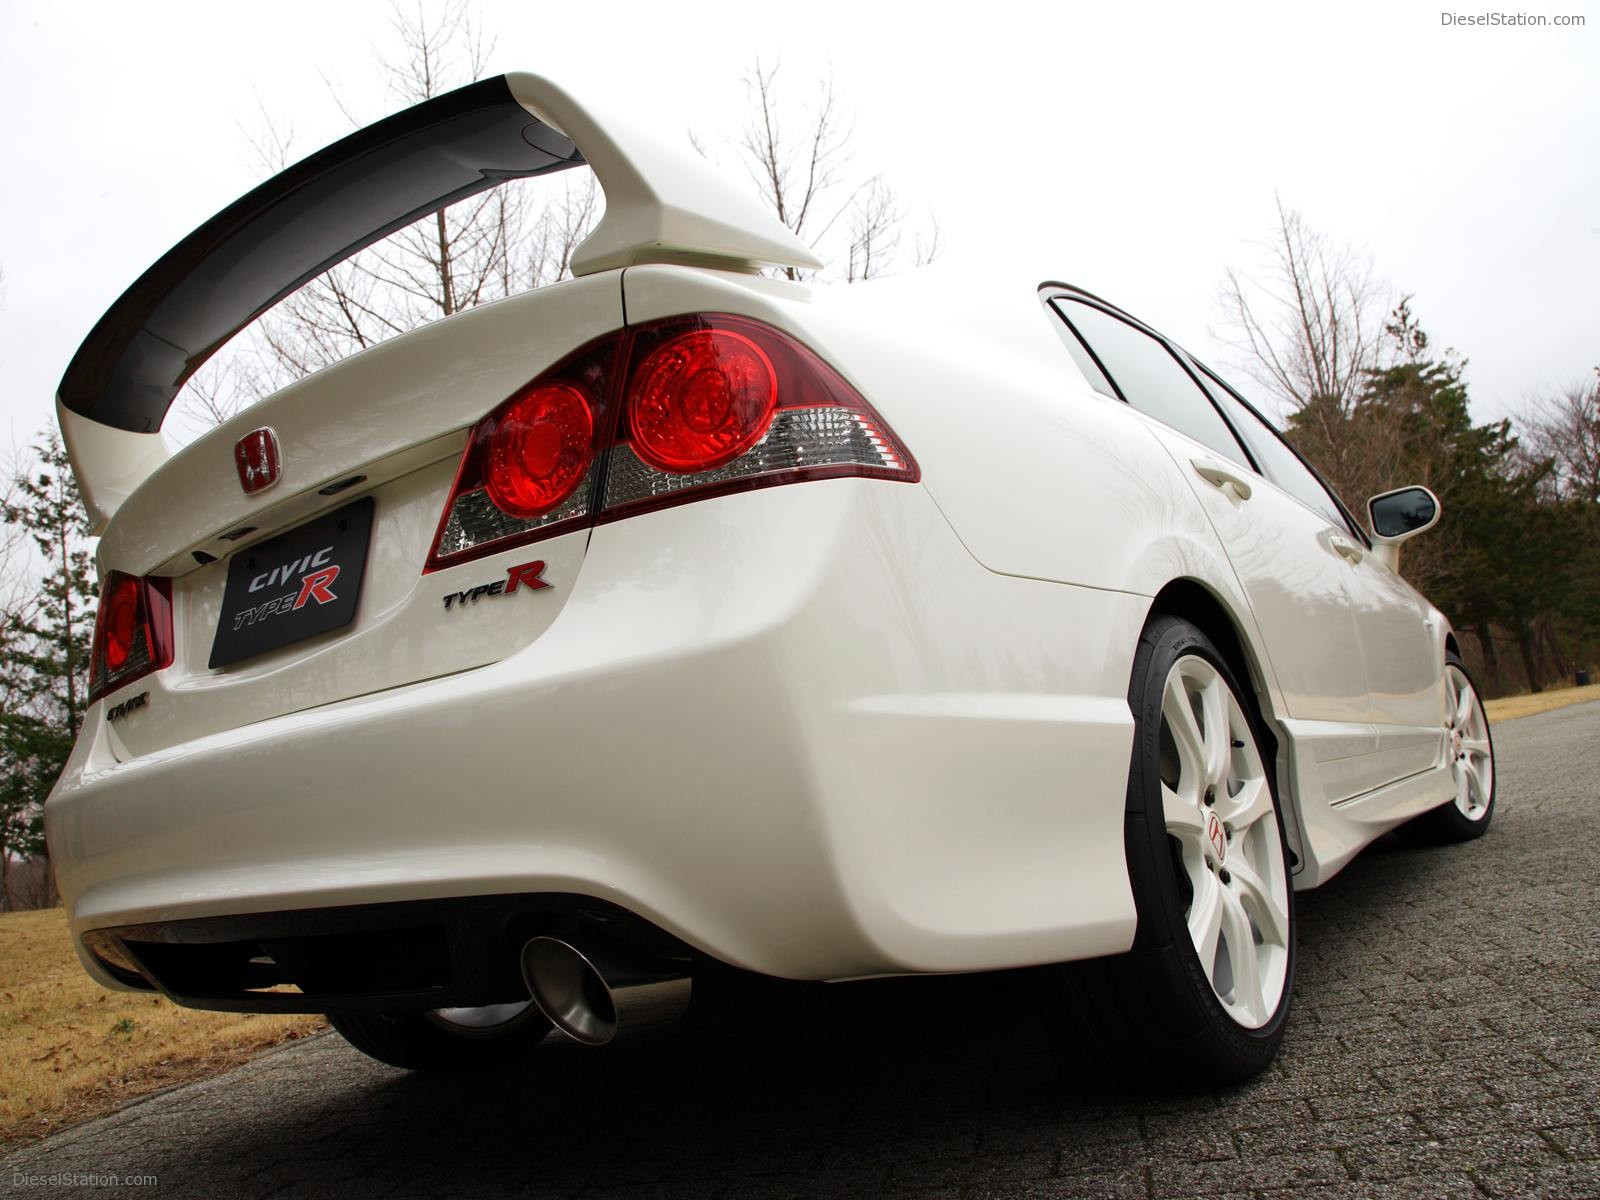 Honda Civic Type R Wallpapers Exotic Car Wallpapers 14 of 1600x1200